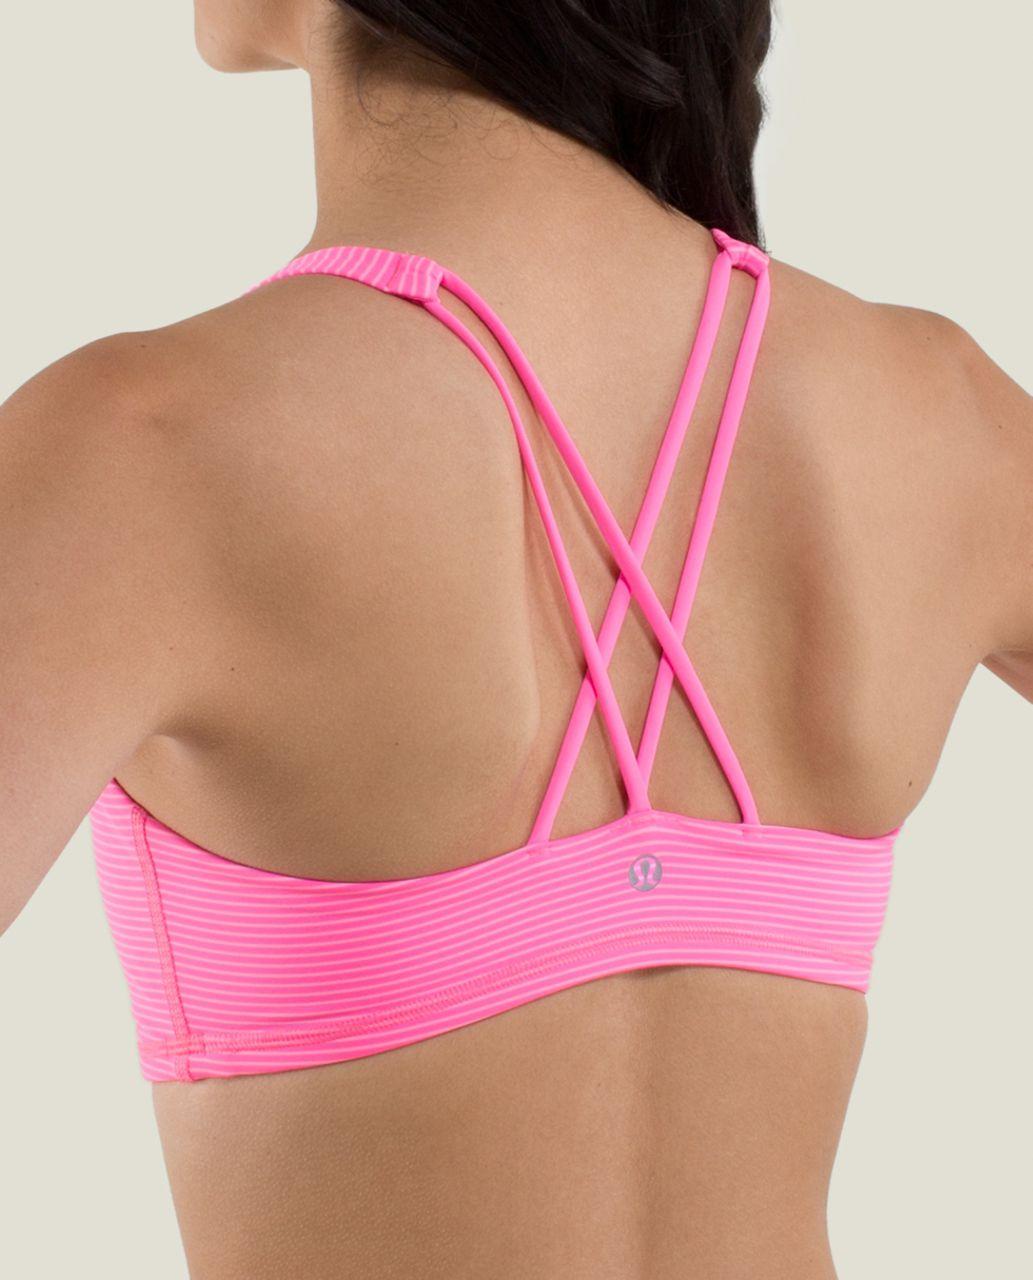 Lululemon Free To Be Bra - Mini Hyper Stripe Zing Pink Light / Zing Pink Light